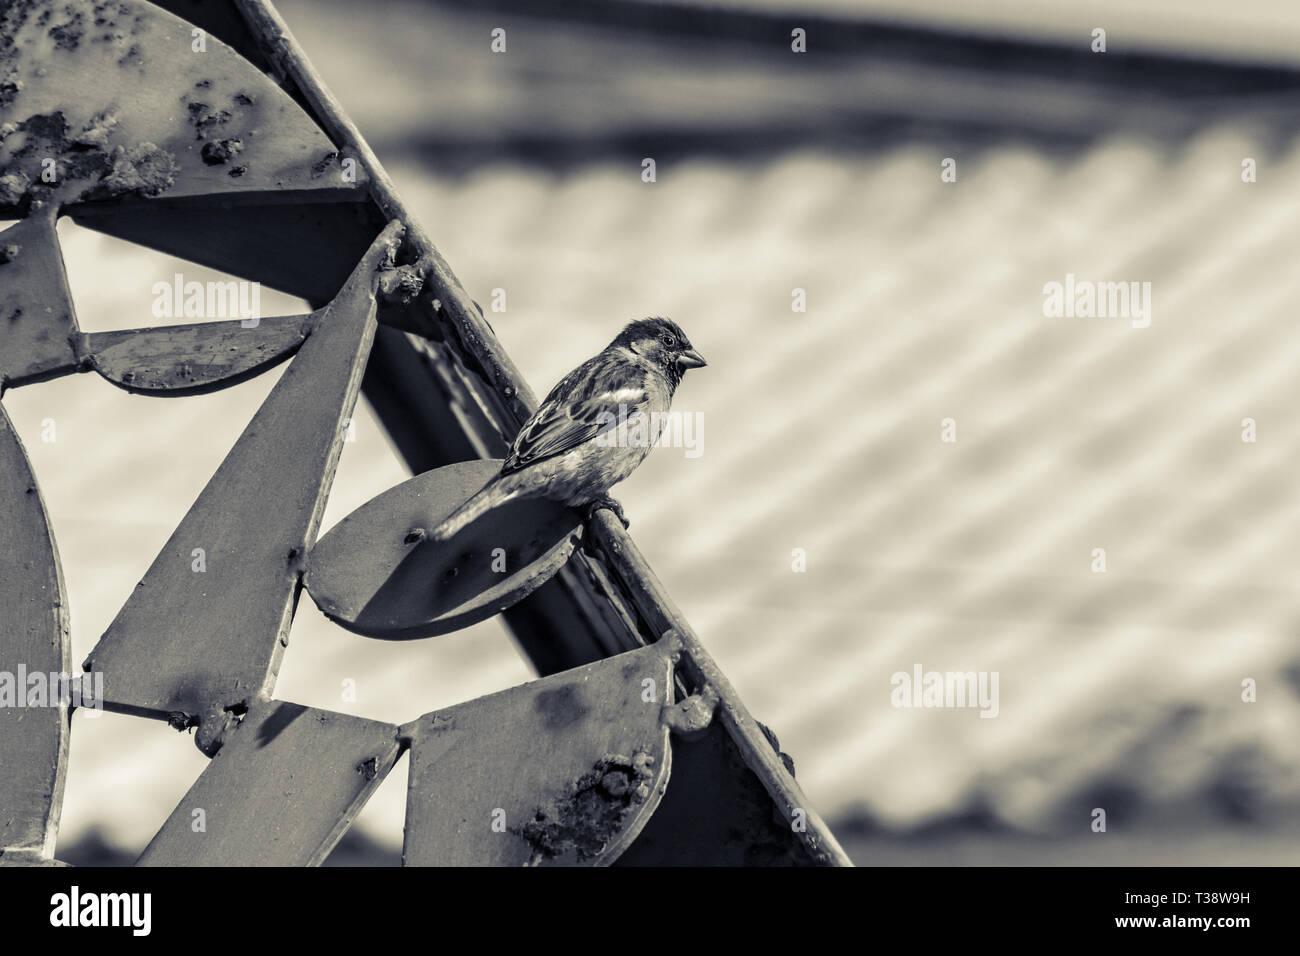 Little bird standing on a metal structure full of rust. Picture taken in Punta del Este, Uruguay - Stock Image